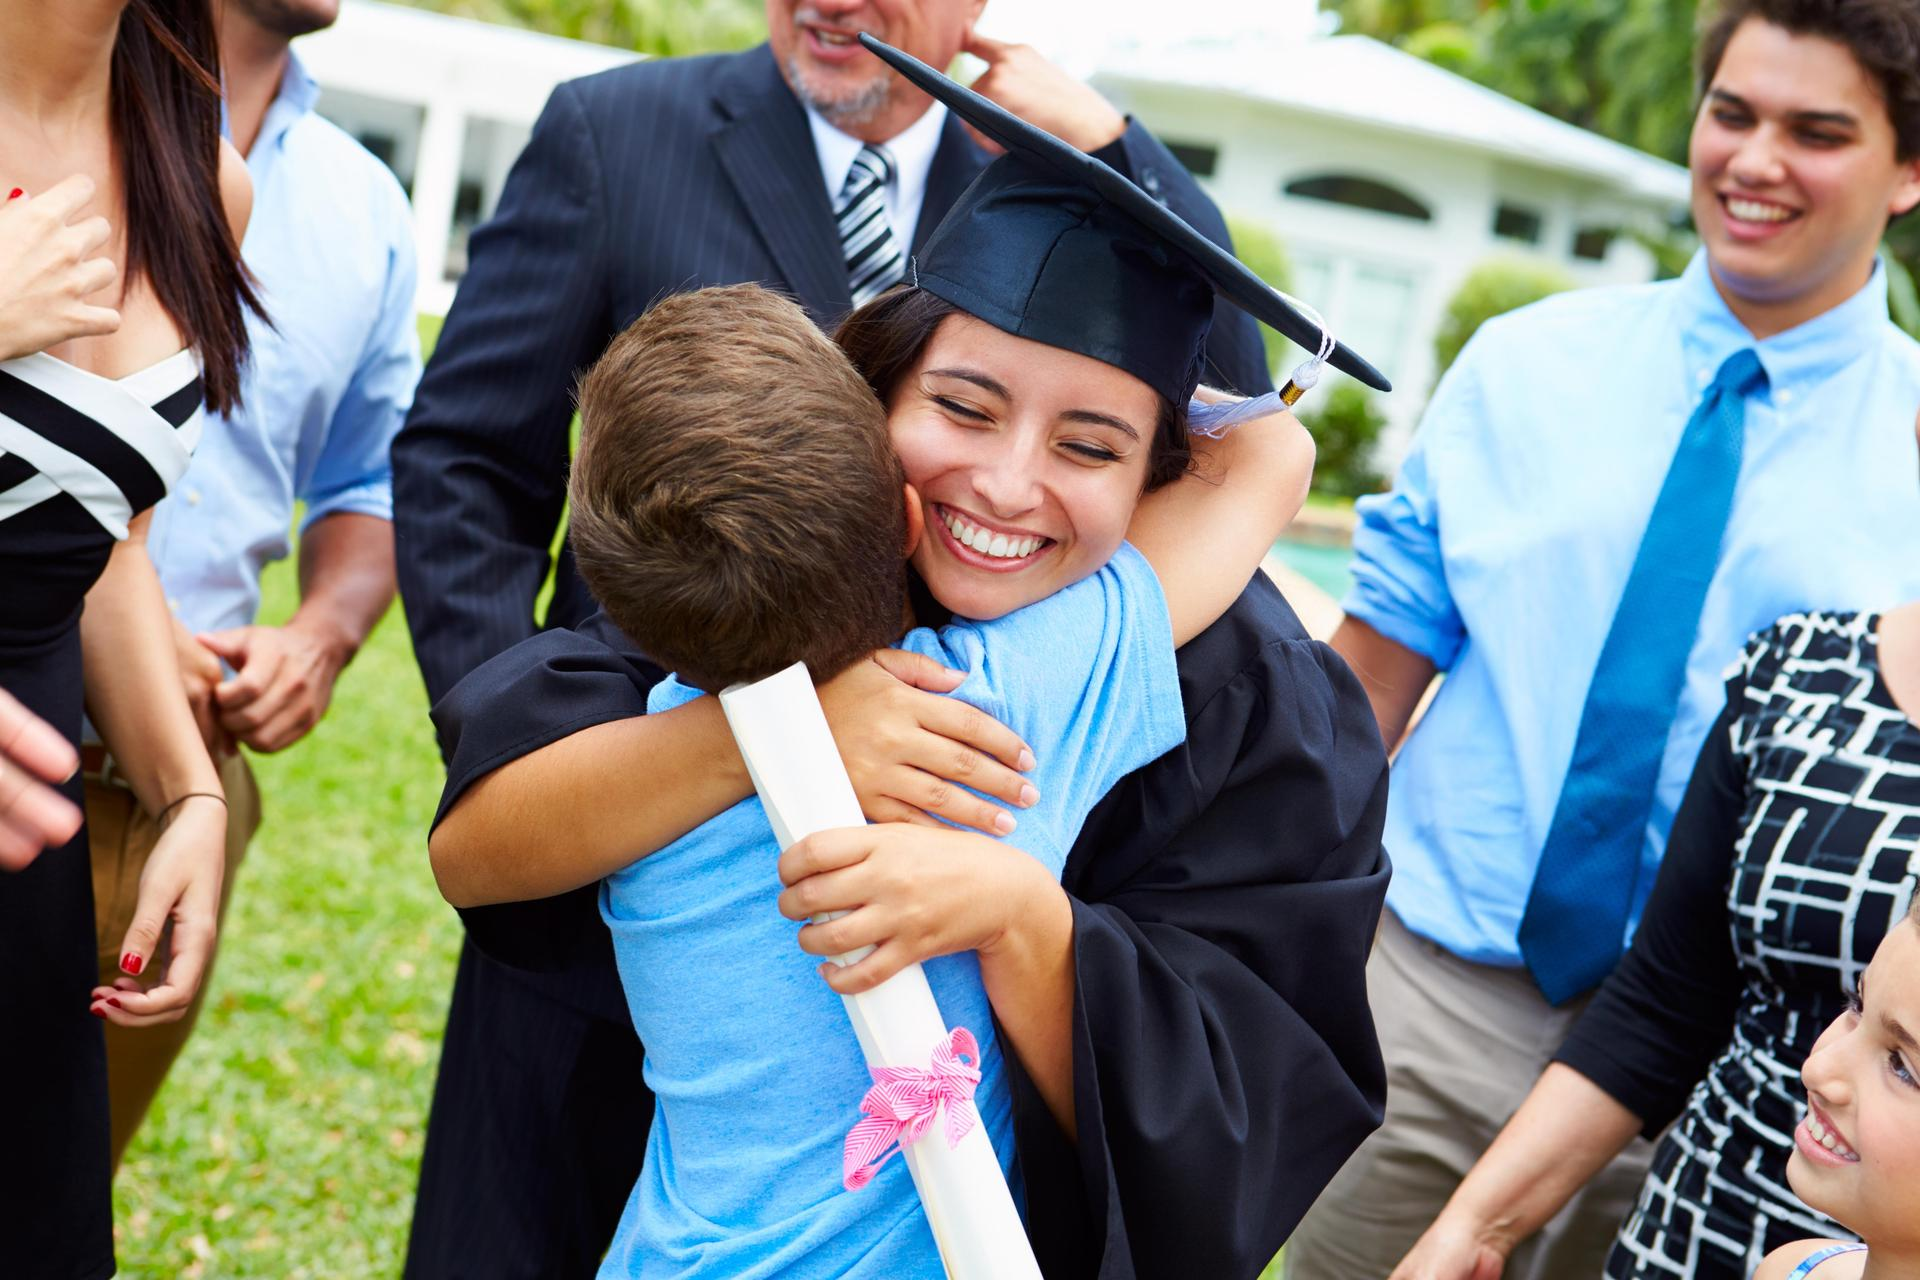 Proud graduate mom, hugging her son, smiling.